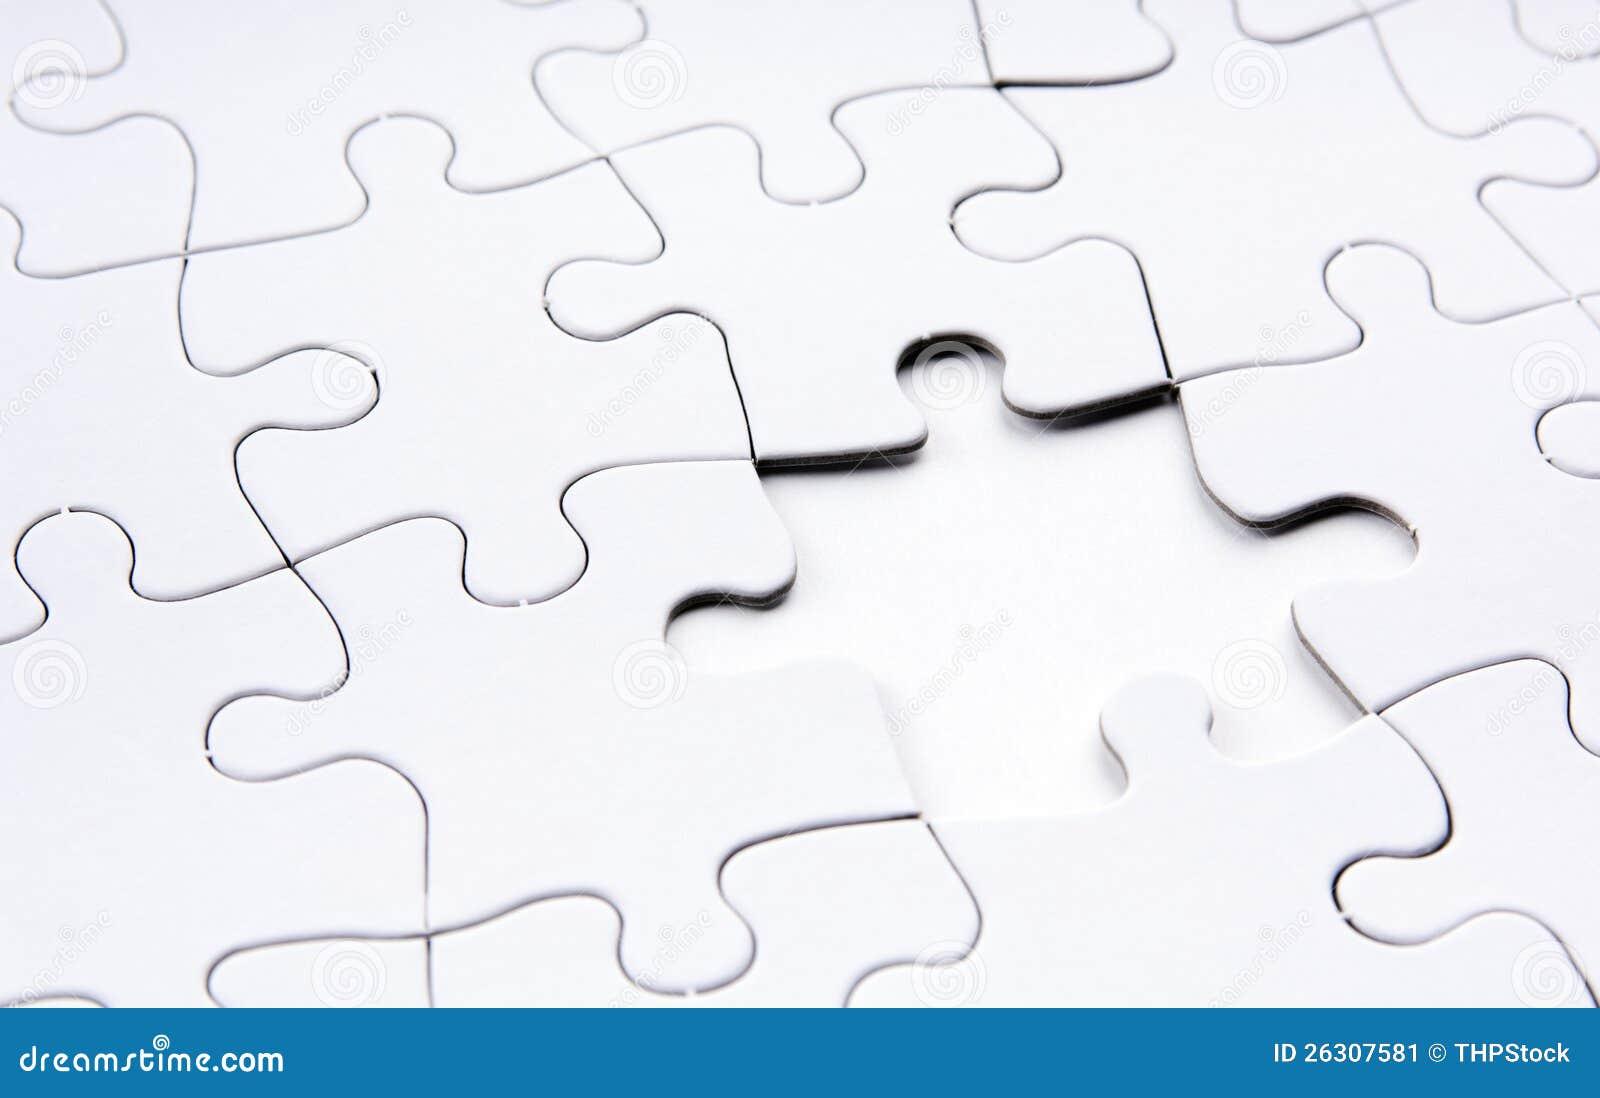 Jigsaw Puzzle Missing Piece Stock Image - Image: 26307581